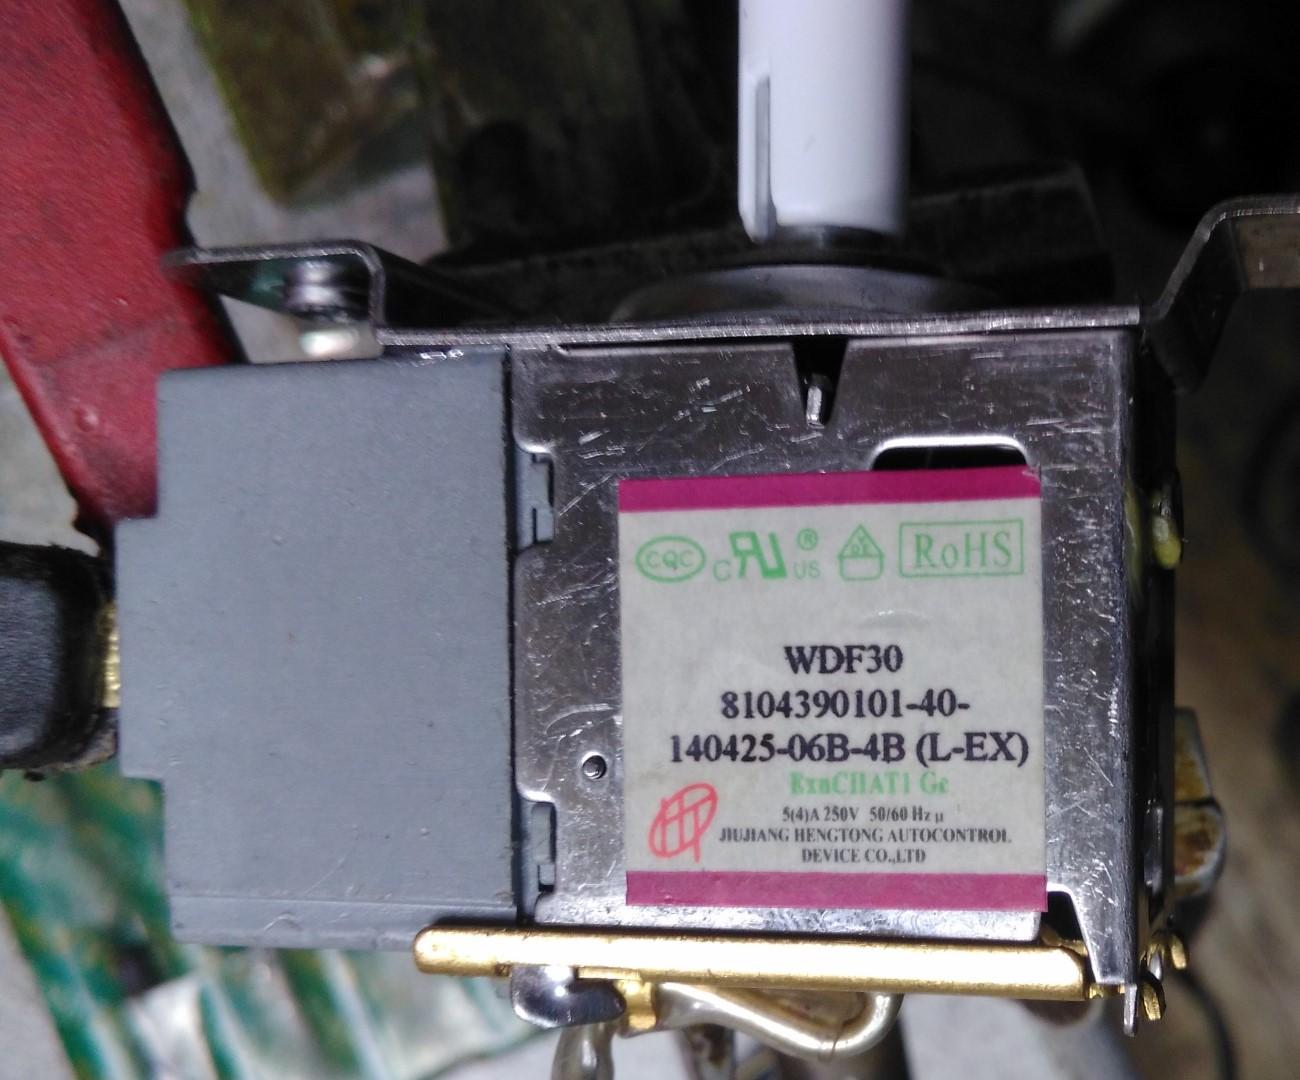 Smeg Kühlschrank Thermostat Tauschen : Smeg kühlschrank thermostat tauschen smeg kühlschrank thermostat